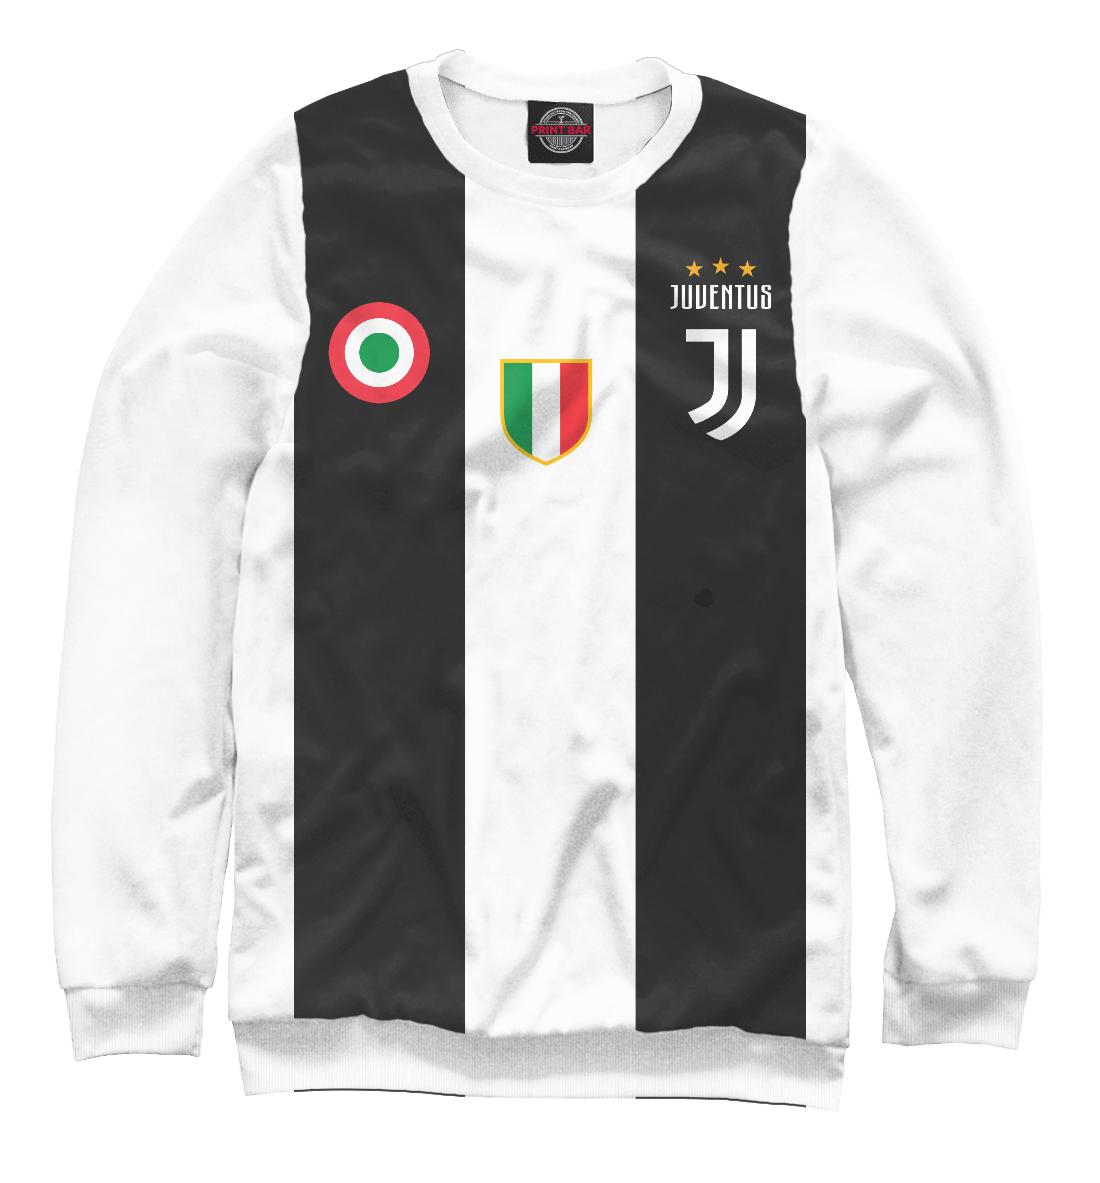 Купить Ronaldo Juventus 18/19, Printbar, Свитшоты, JUV-954883-swi-1